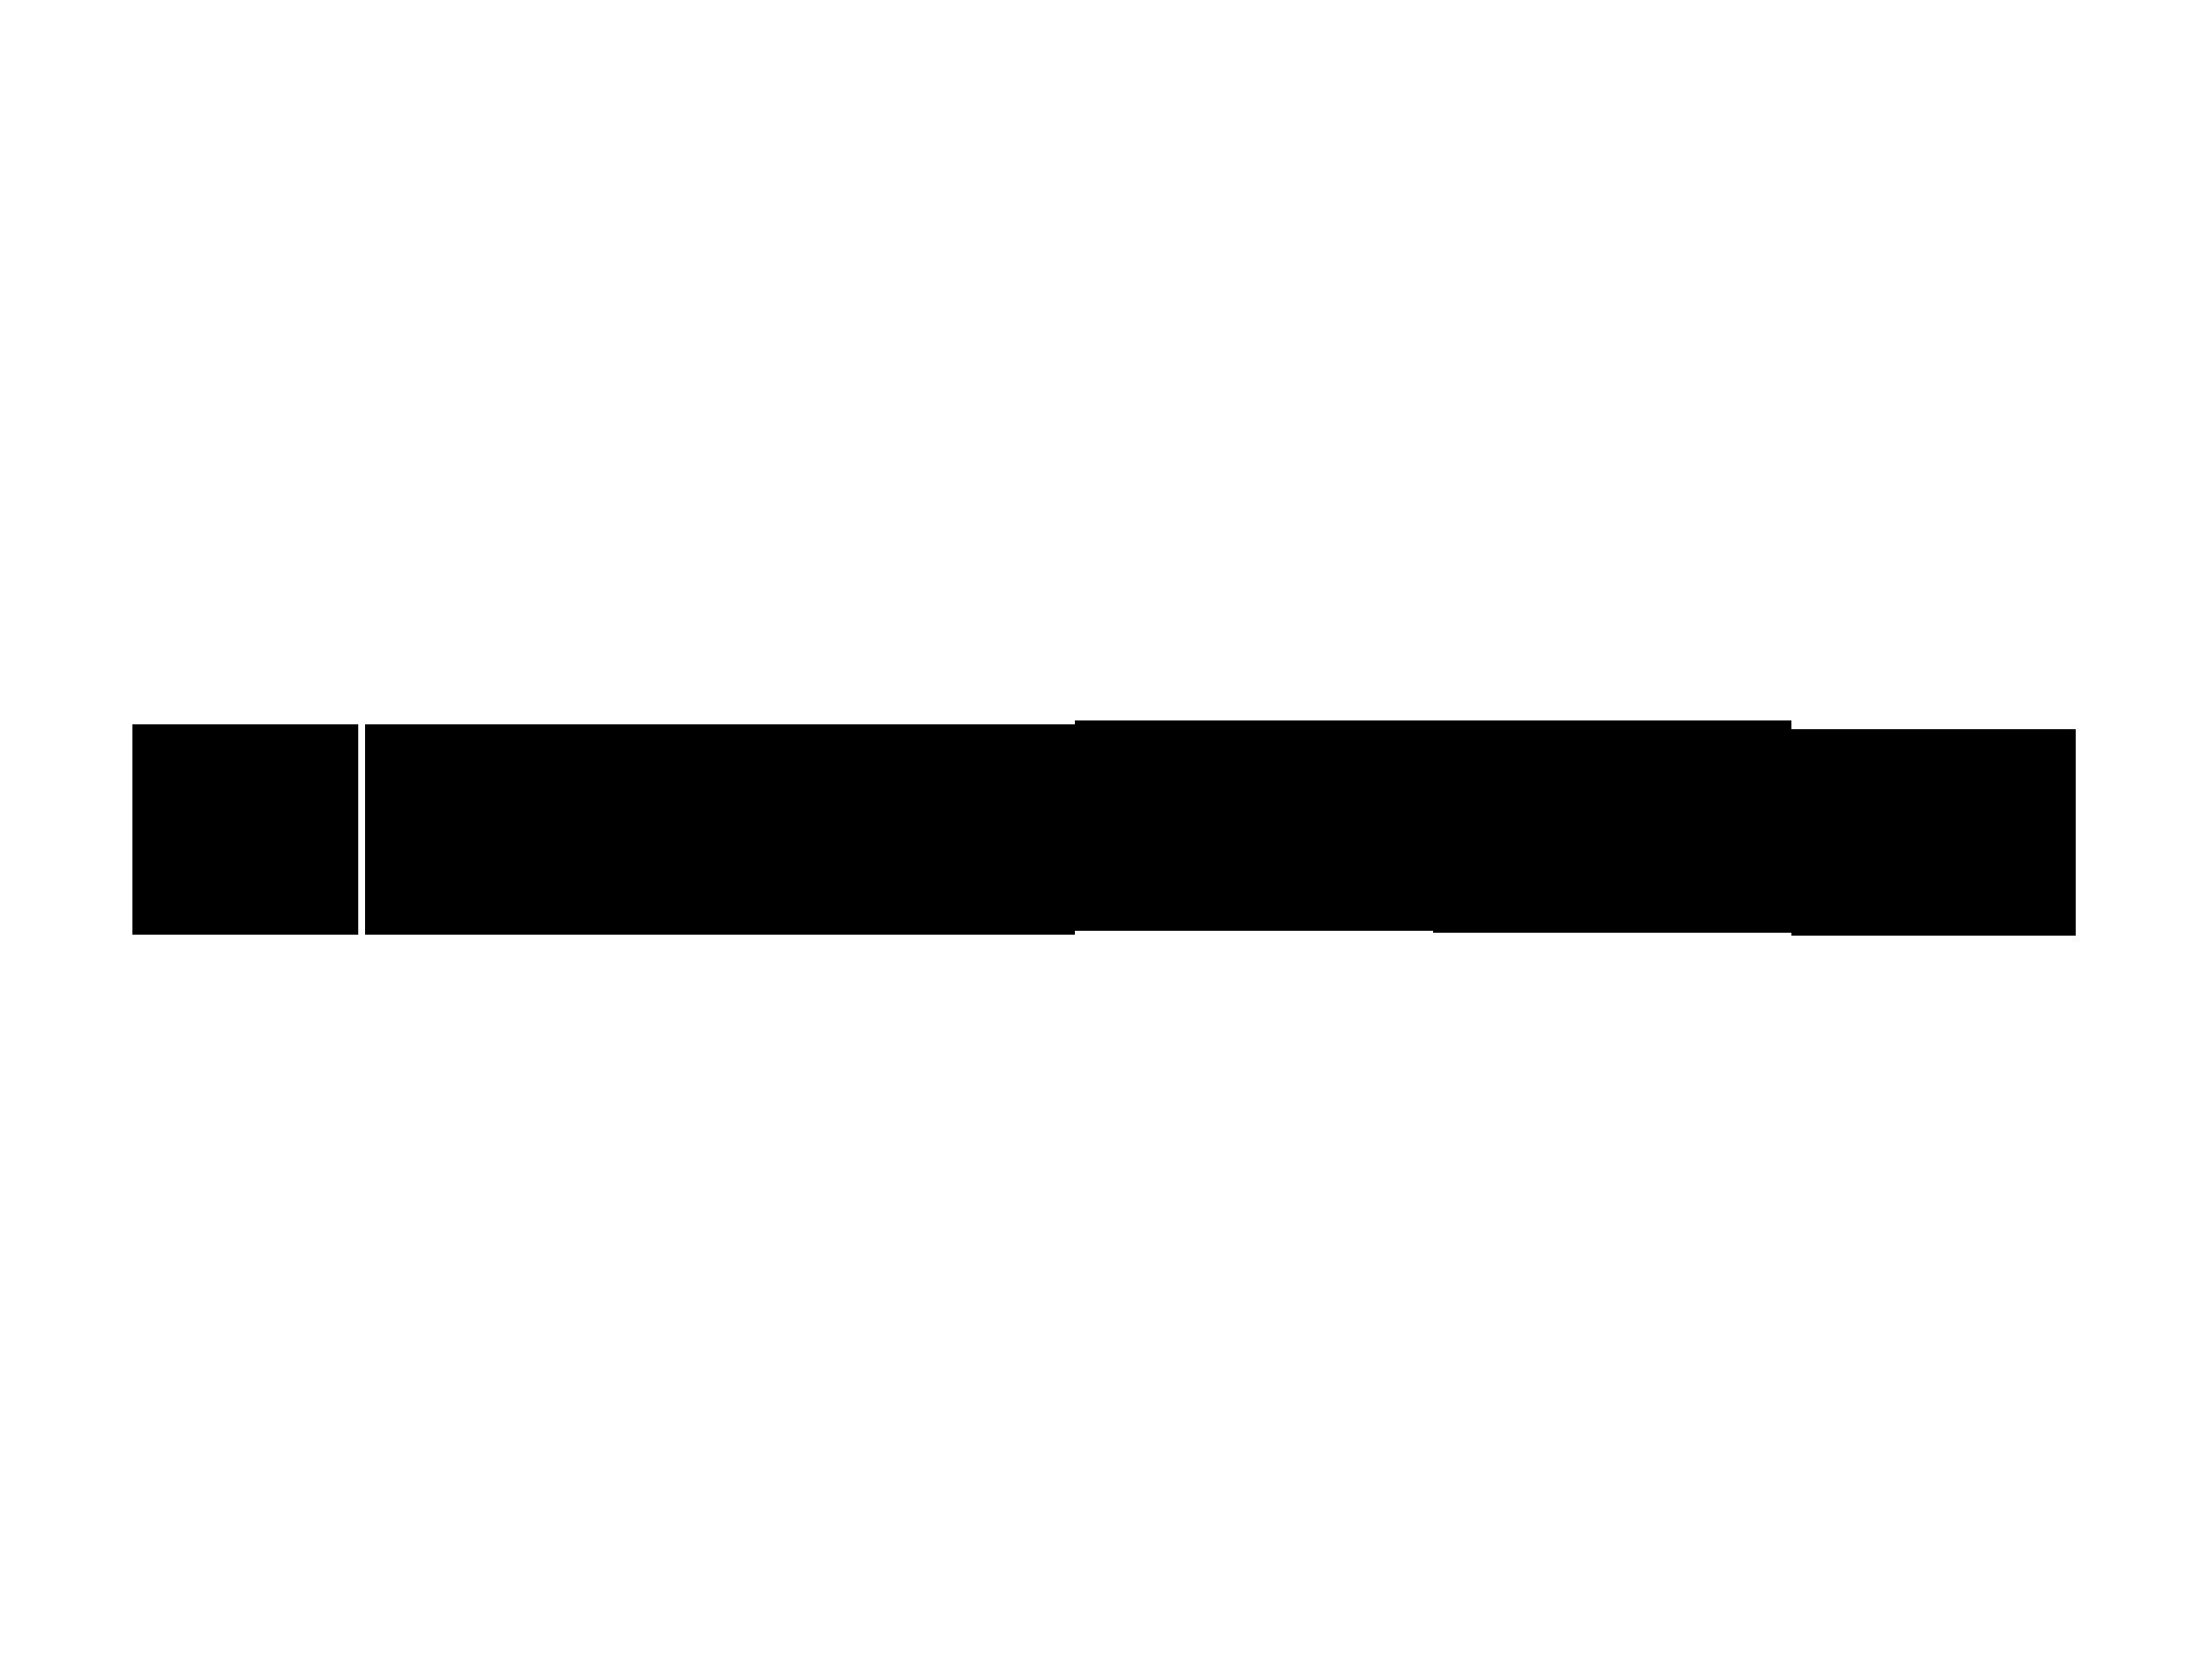 Giorgio-Armani-logo-wordmark.png